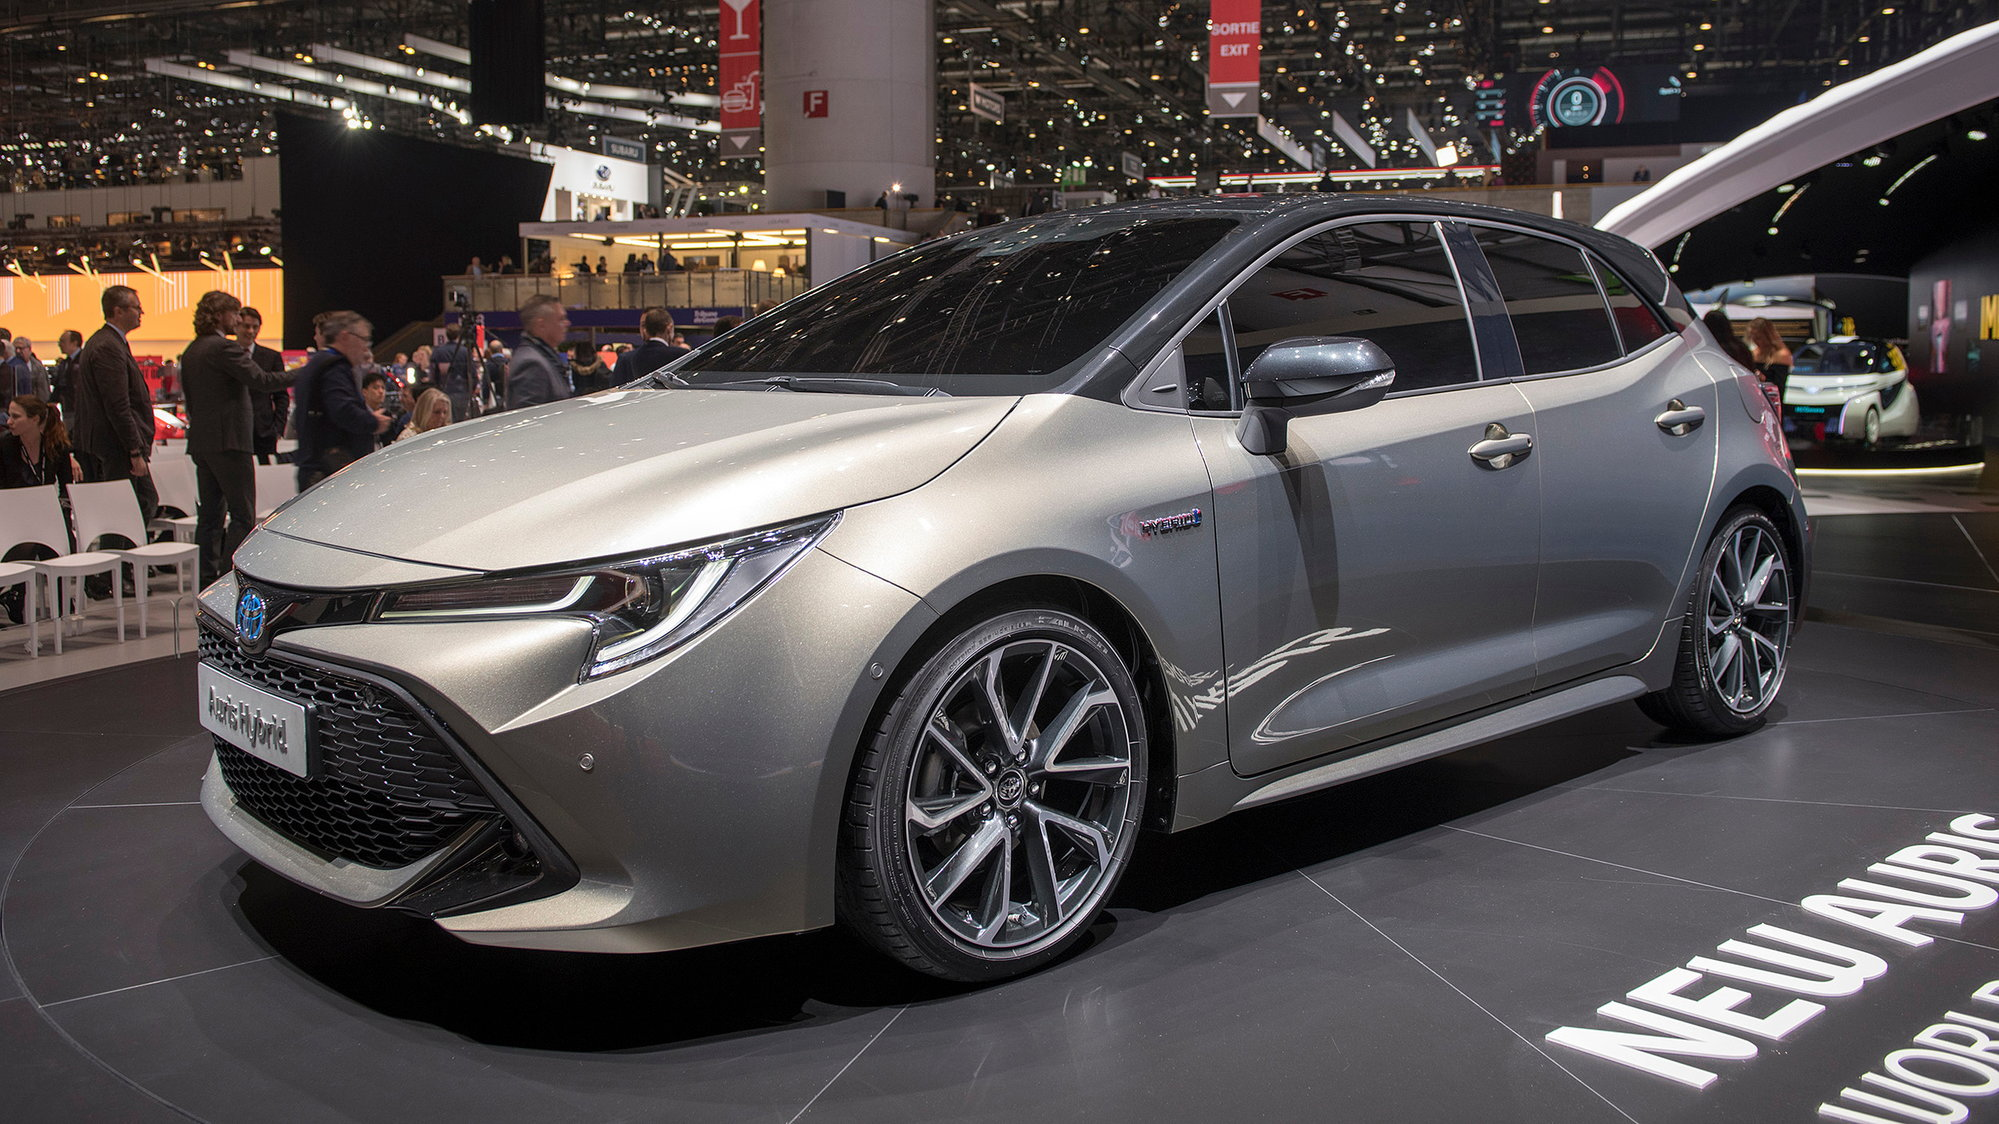 Lexus Ct 2019 >> Stunning new 2019 Auris (Corolla iM) - ClubLexus - Lexus Forum Discussion